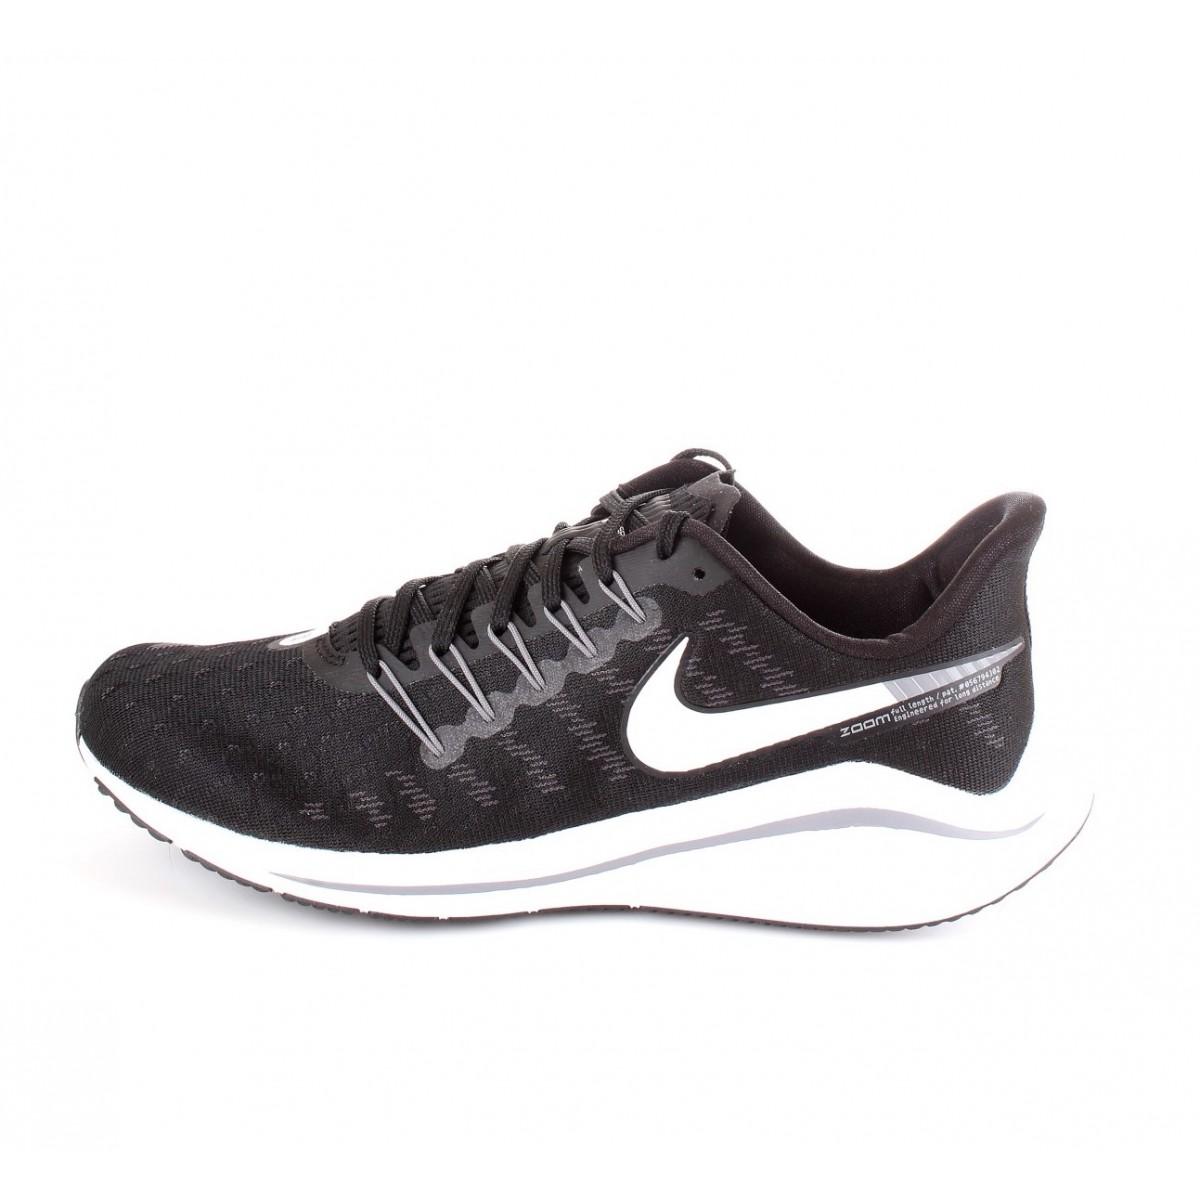 92621855fe3ce Nike Scarpe Air Zoom Vomero 14